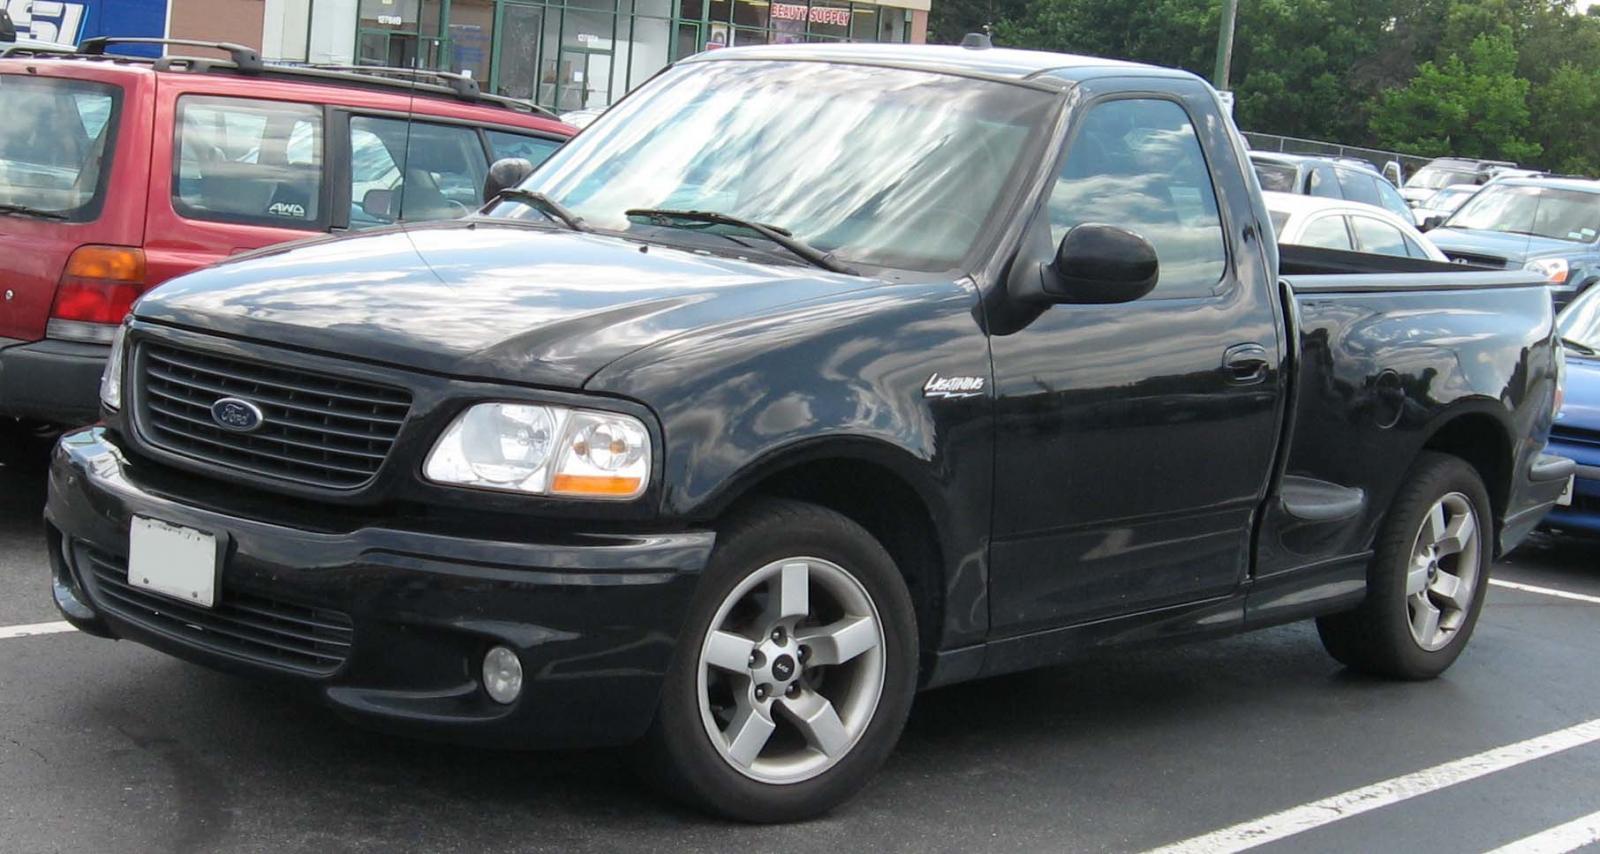 800 1024 1280 1600 origin 1999 ford f 150